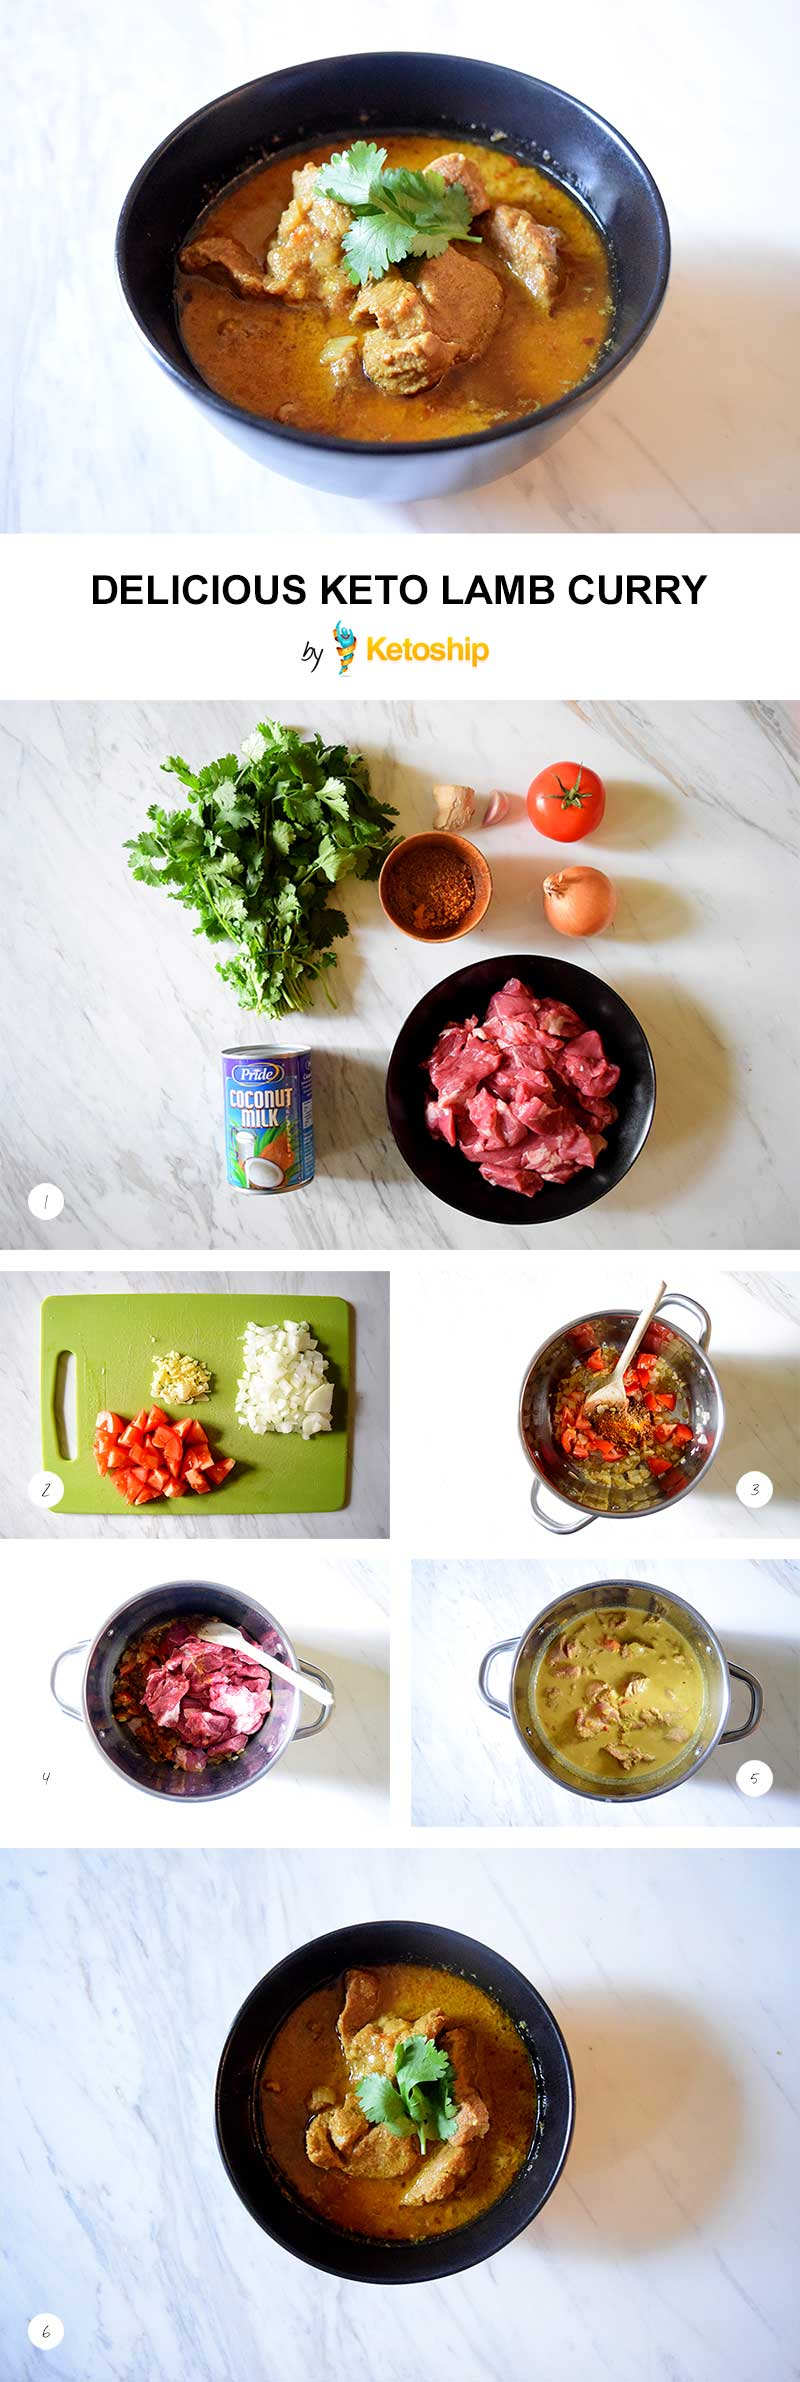 Delicious Keto Lamb Curry Recipe | Ketoship